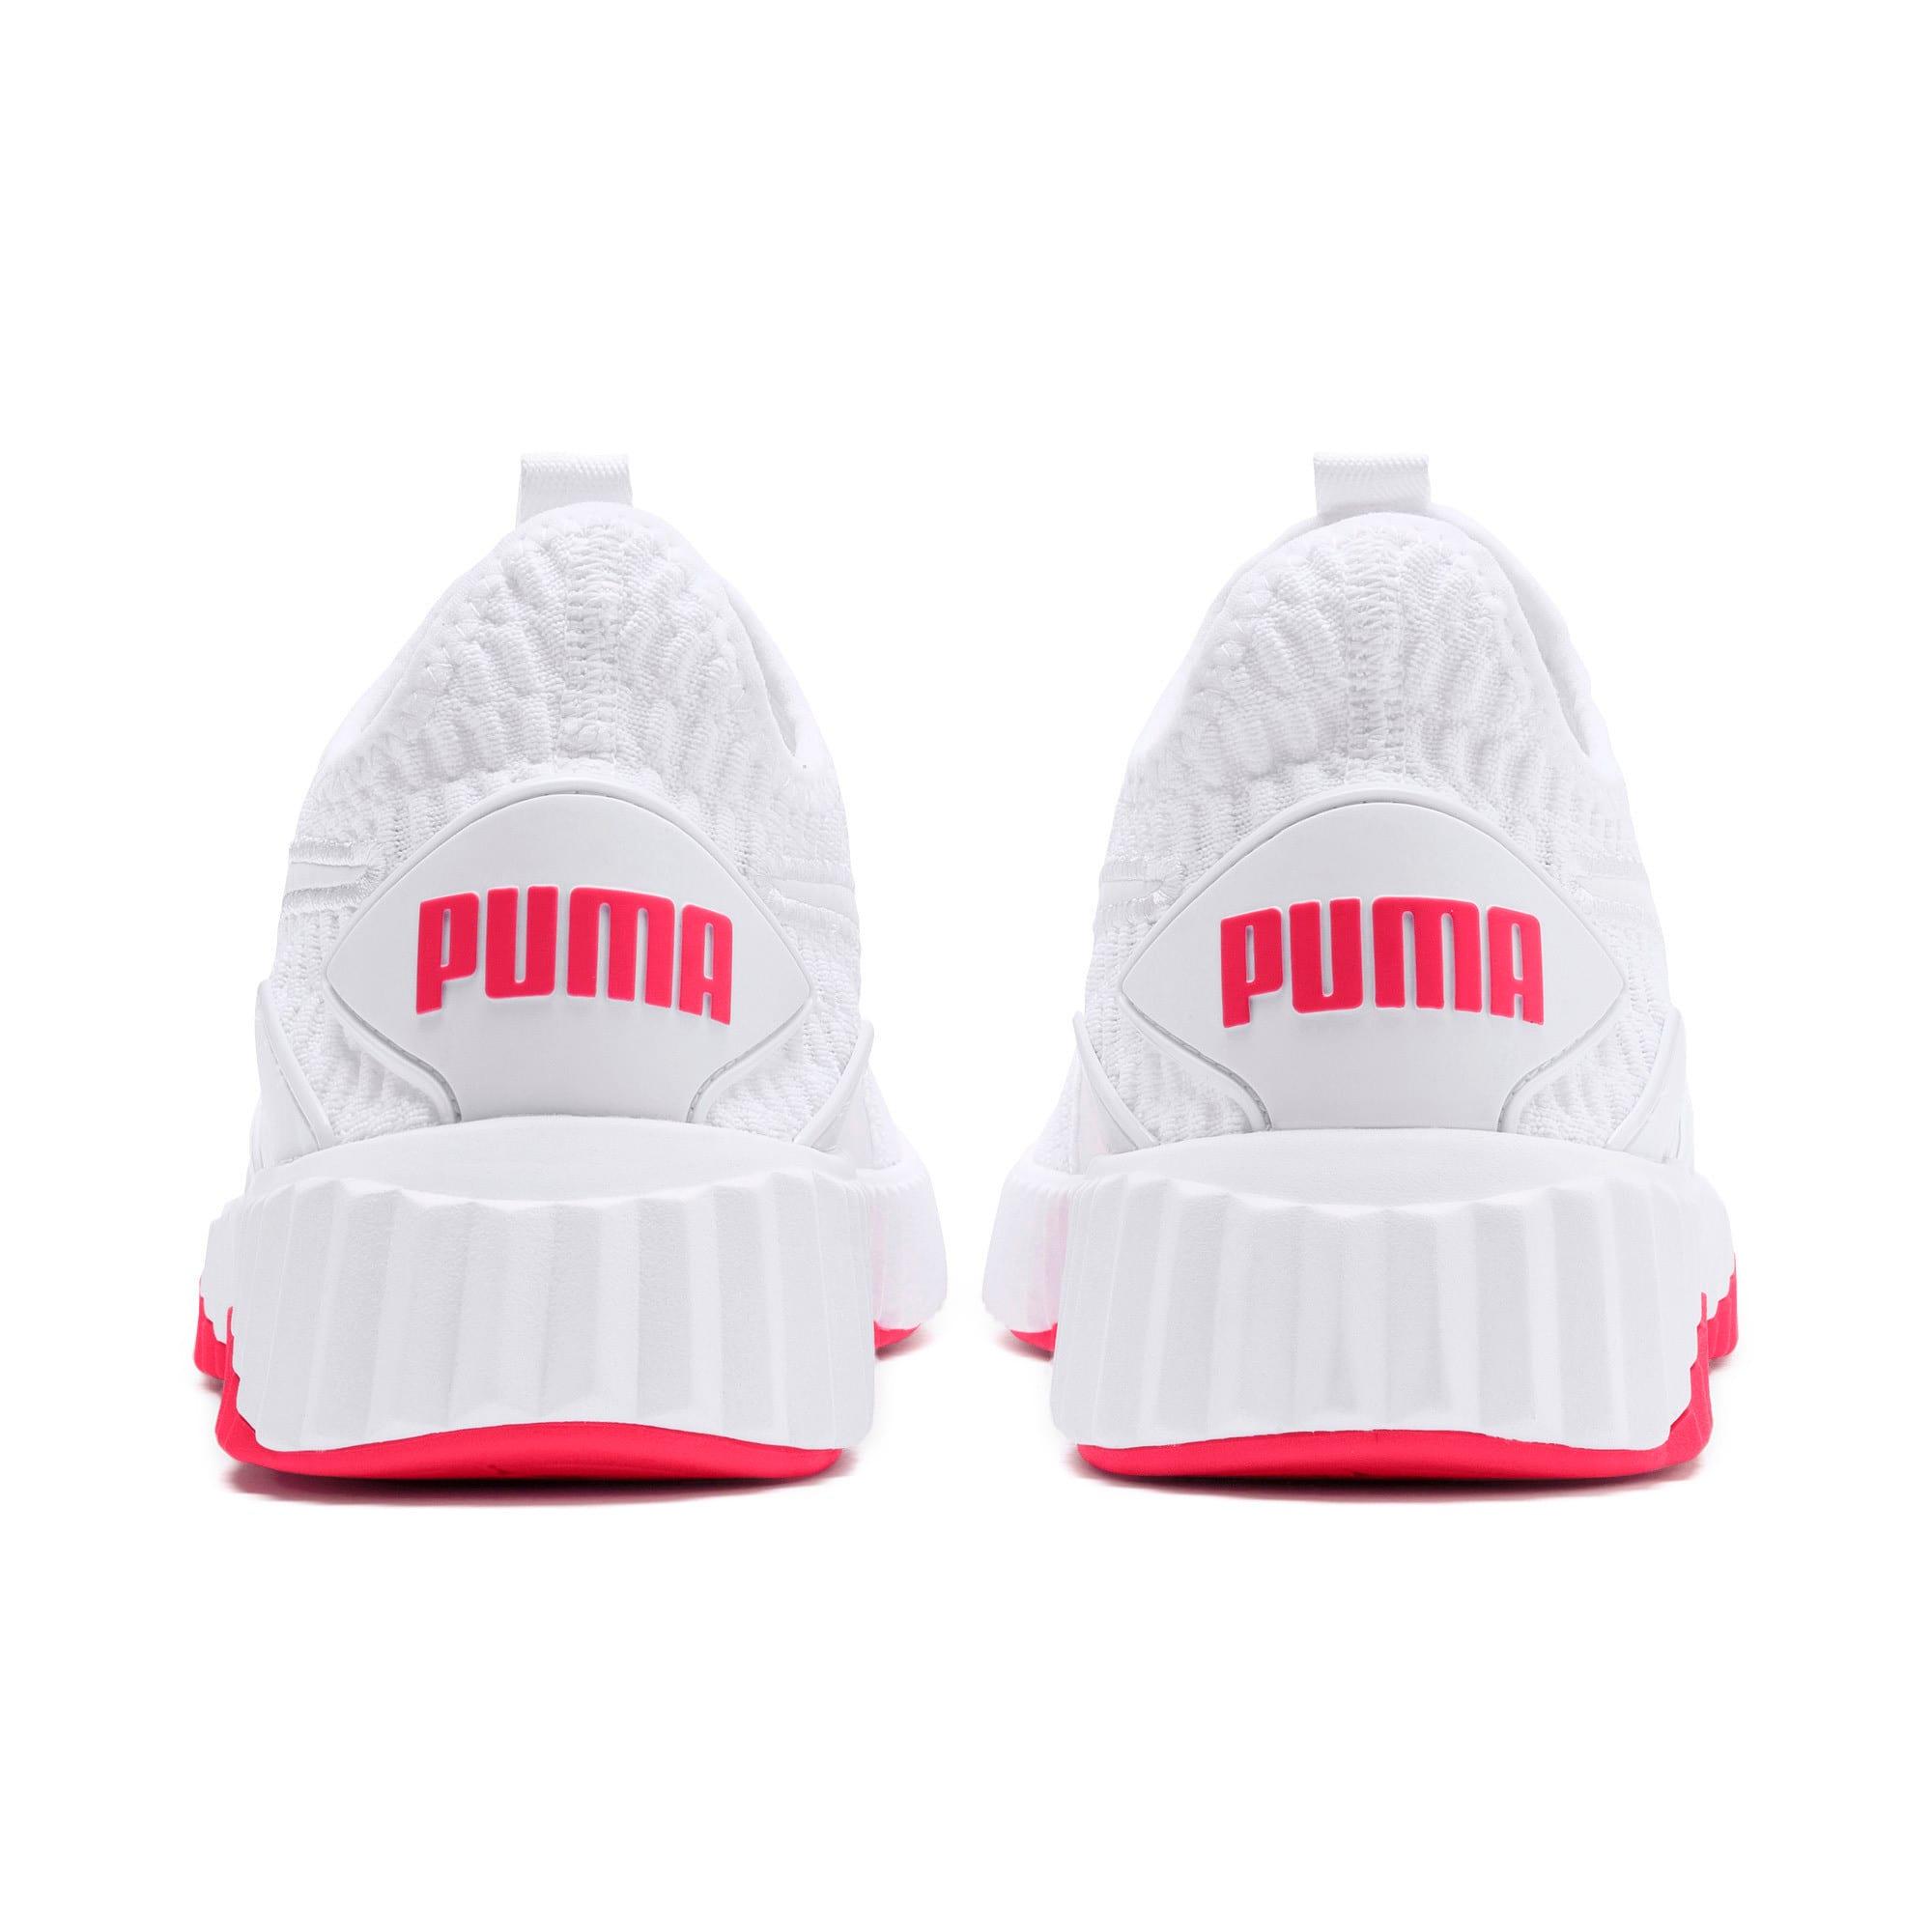 Thumbnail 4 of Defy Women's Trainers, Puma White-Pink Alert, medium